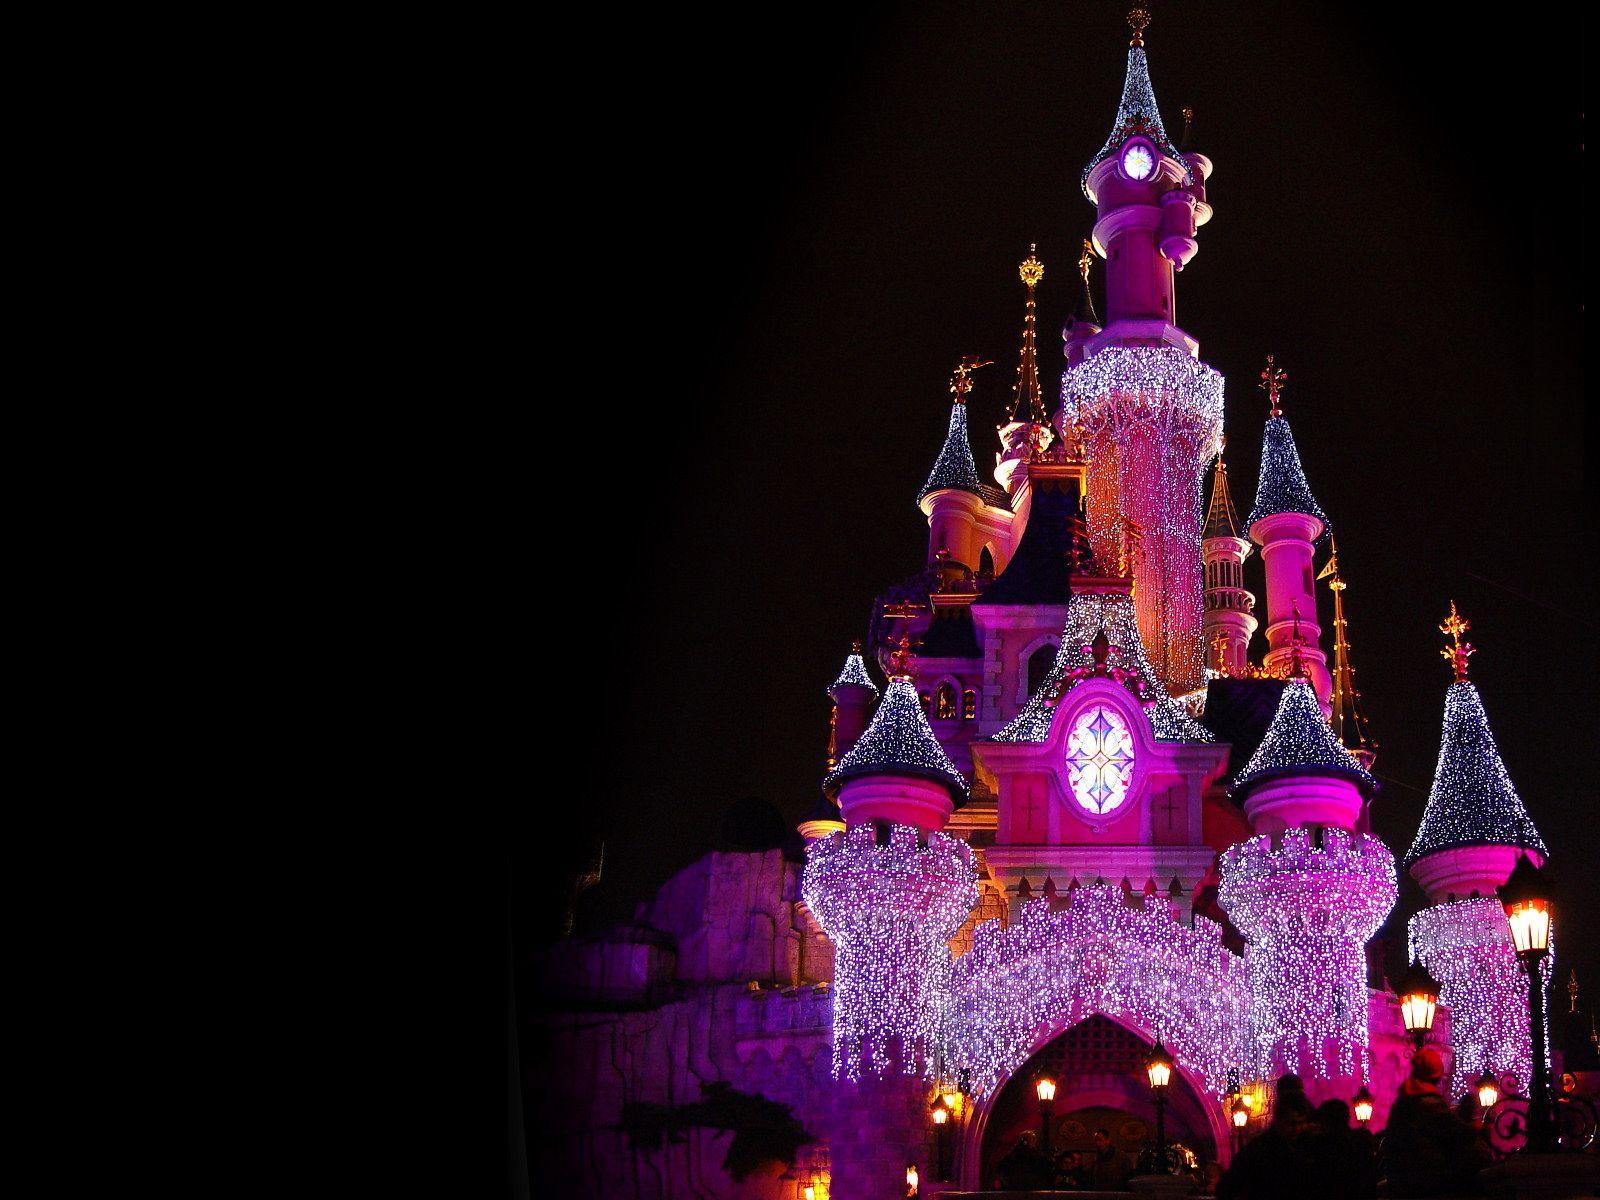 Desktop wallpapers Cinderella Castle Magic Kingdom Tokyo Disneyland 1600x1200